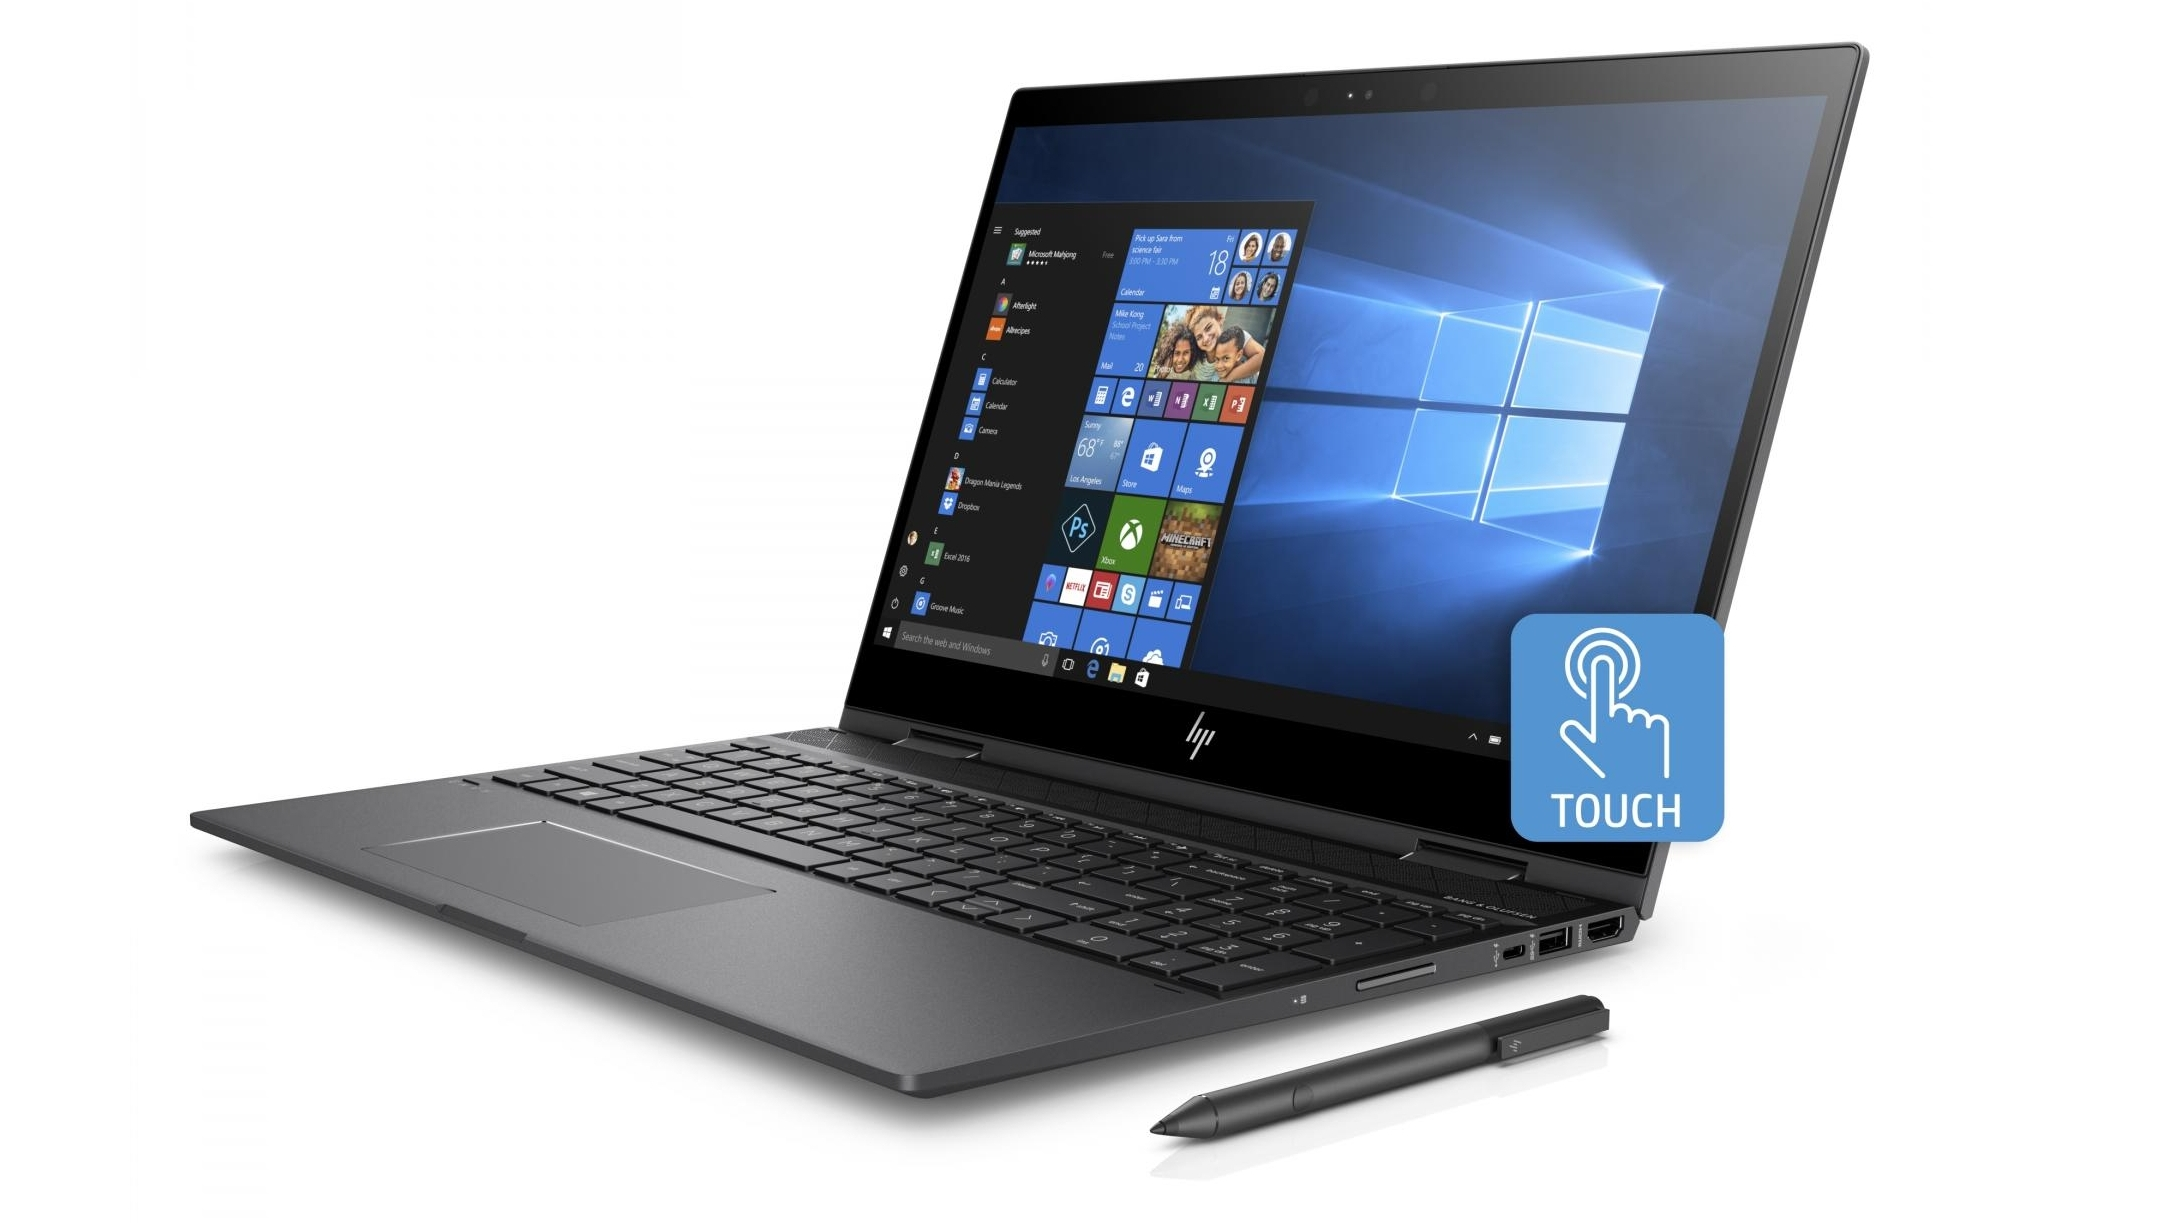 HP Envy X360 15 6-inch Ryzen 3/8GB/128GB SSD 2 in 1 Device